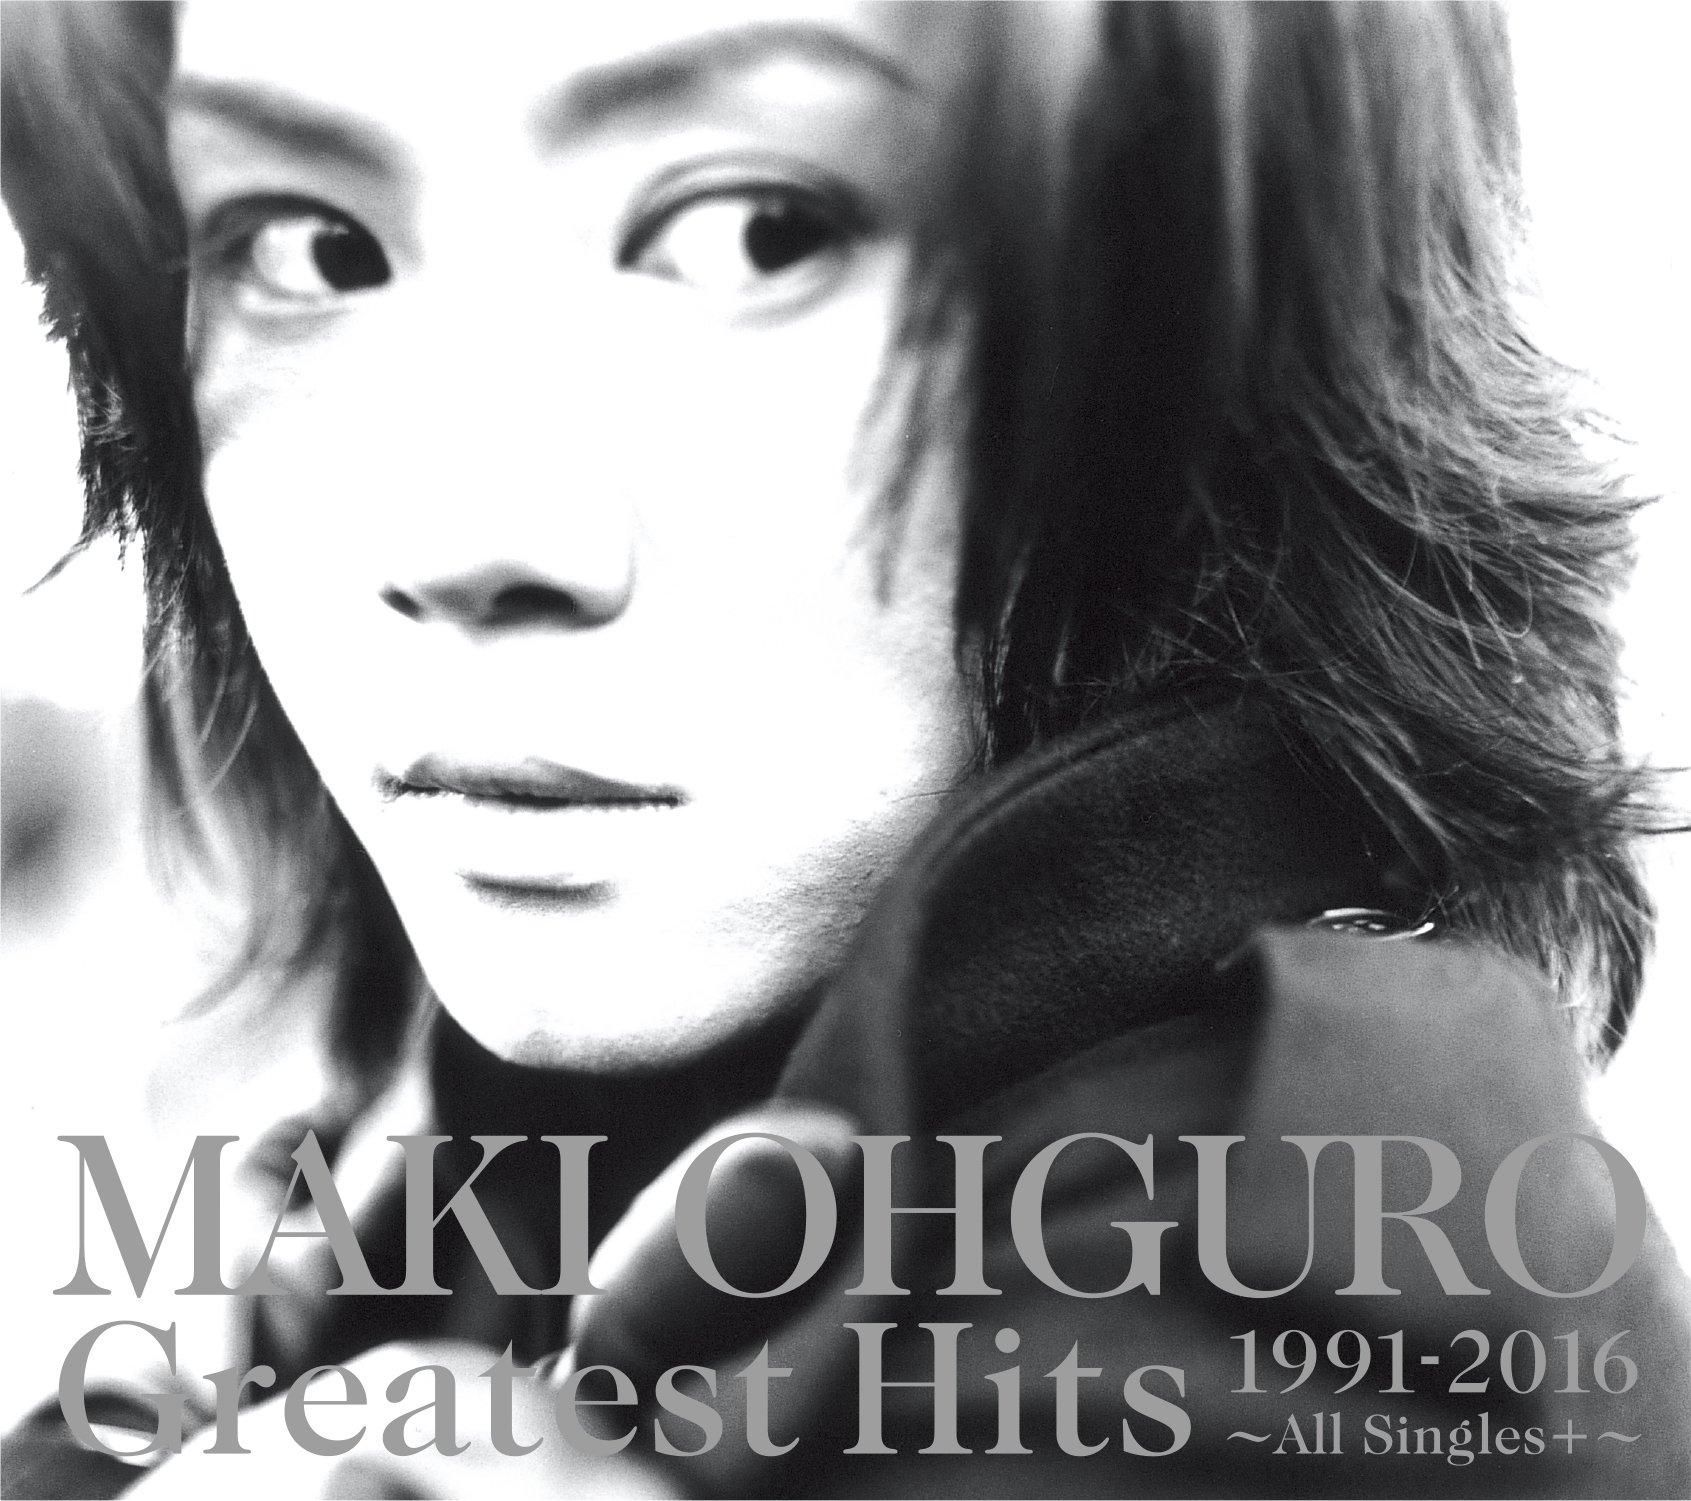 20171020.0054.08 Maki Ohguro - Greatest Hits 1991-2016 ~All Singles+~ cover.jpg